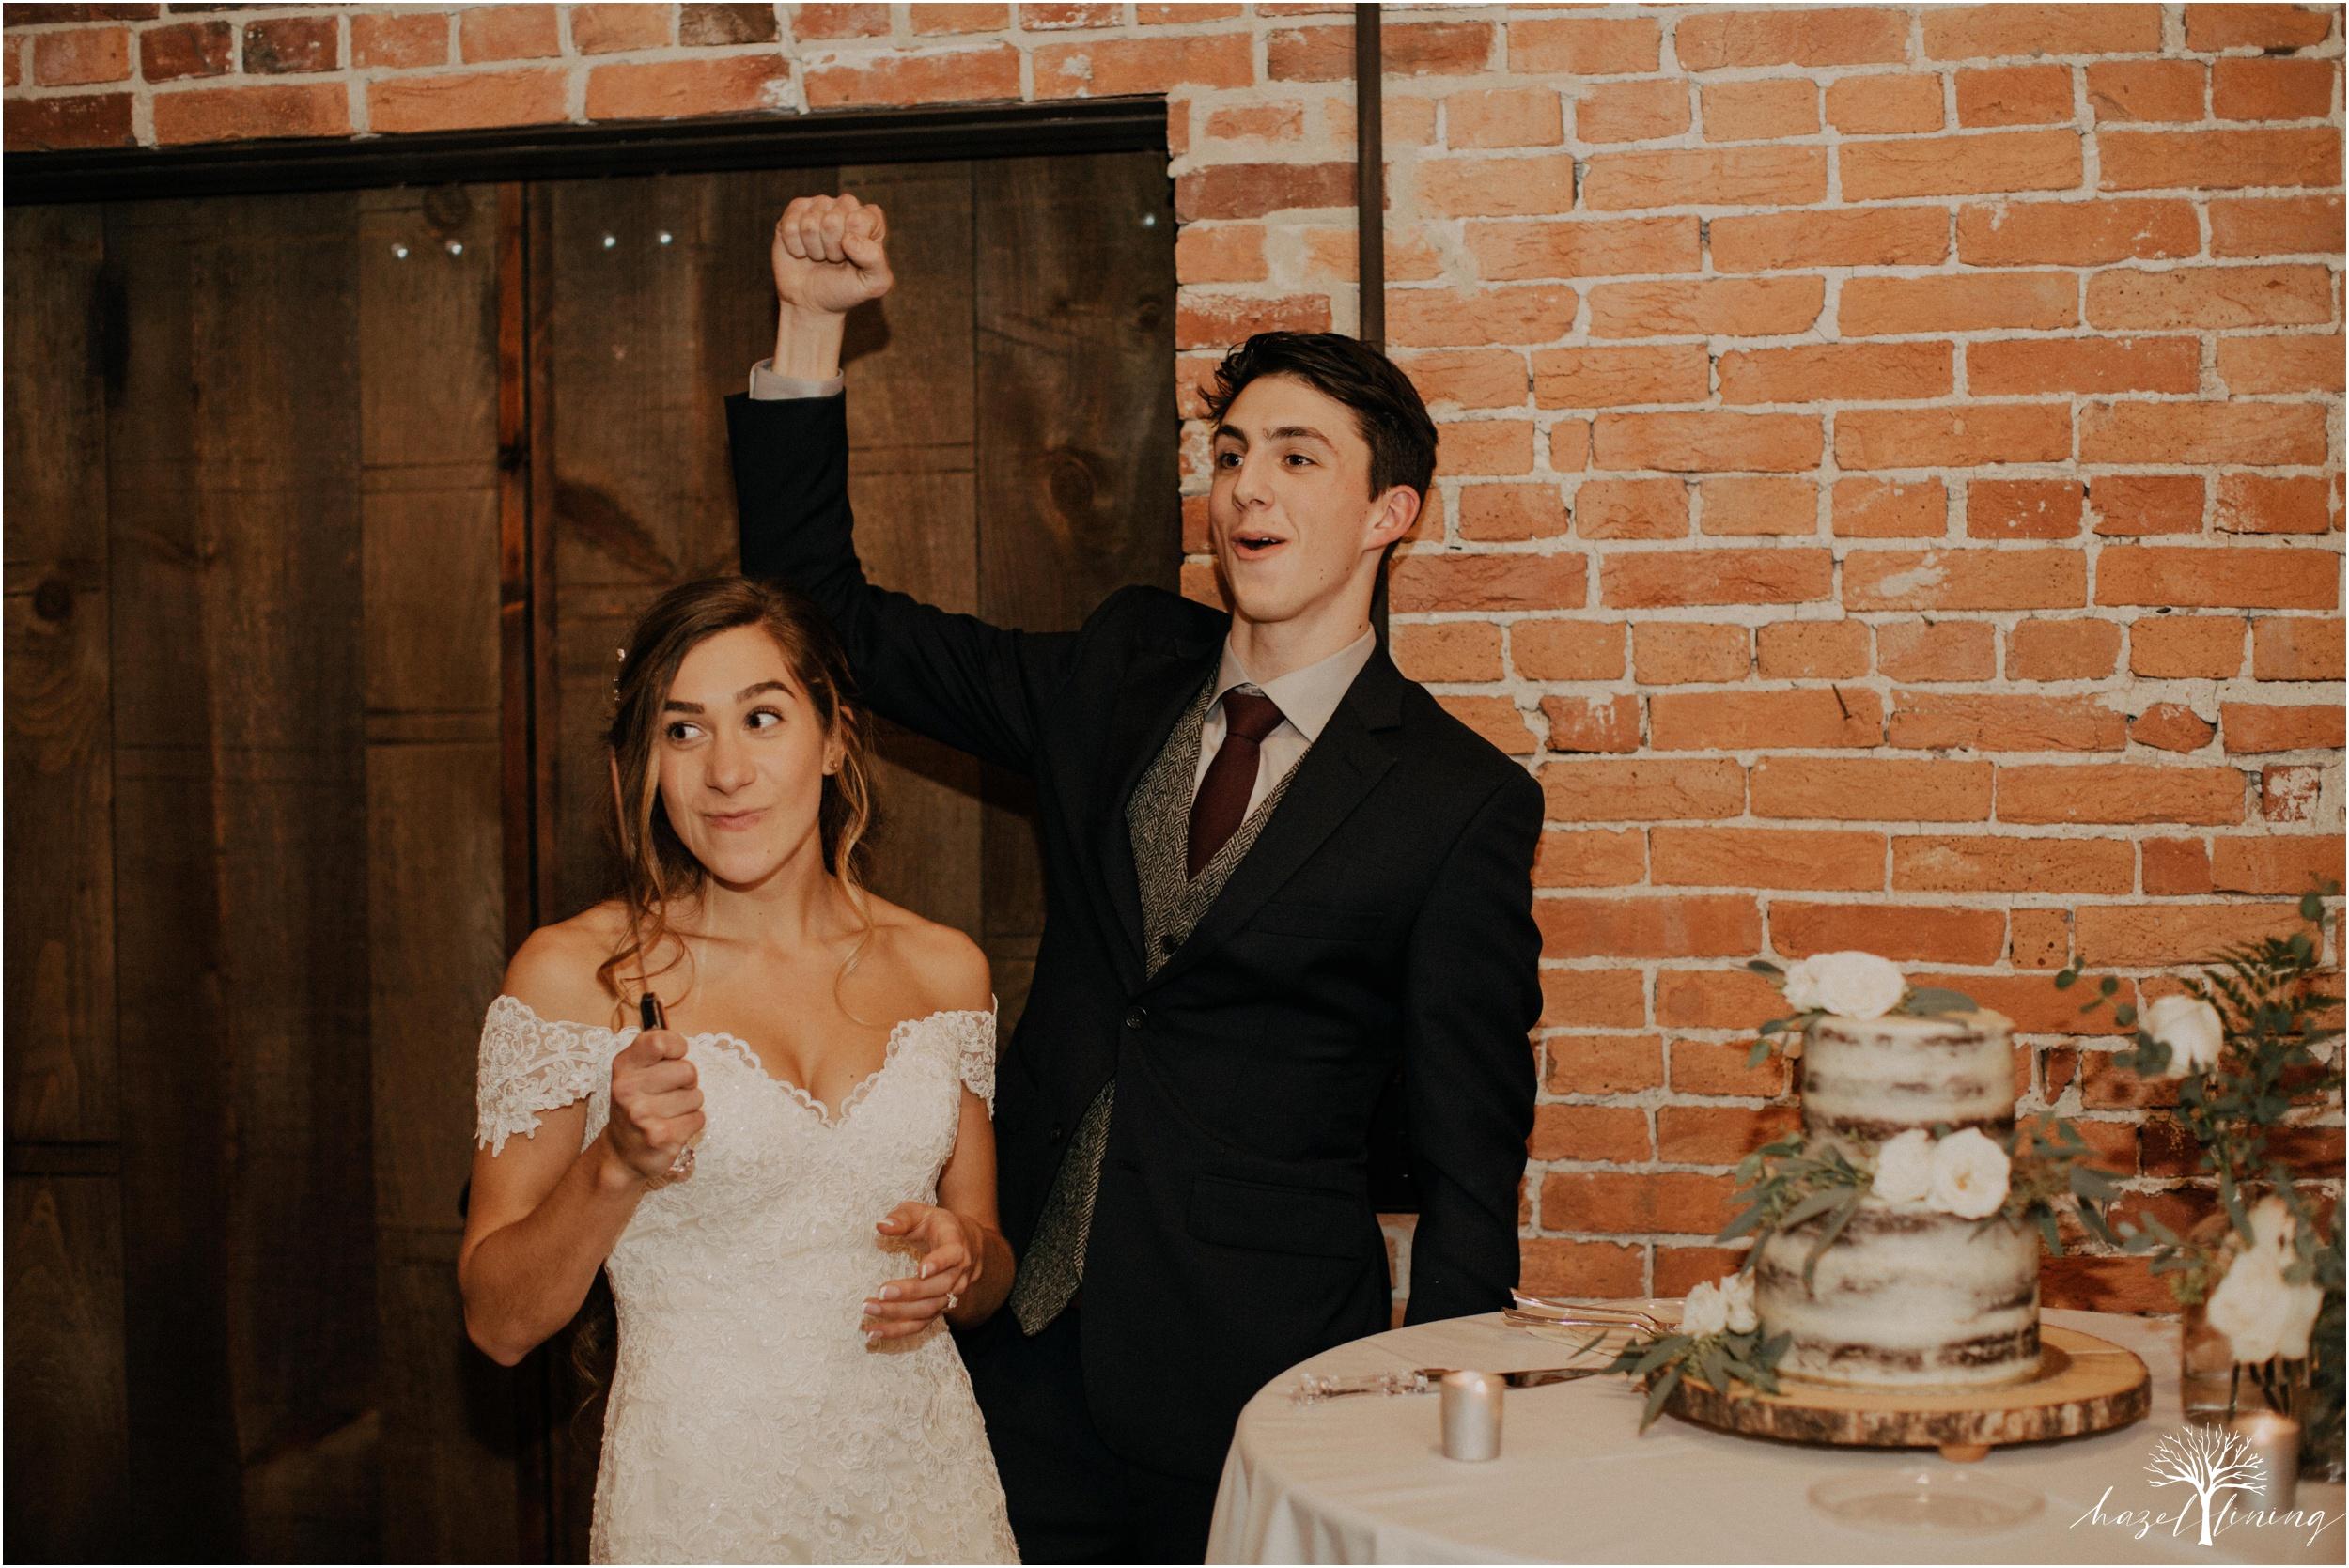 emma-matt-gehringer-the-booking-house-lancaster-manhiem-pennsylvania-winter-wedding_0161.jpg